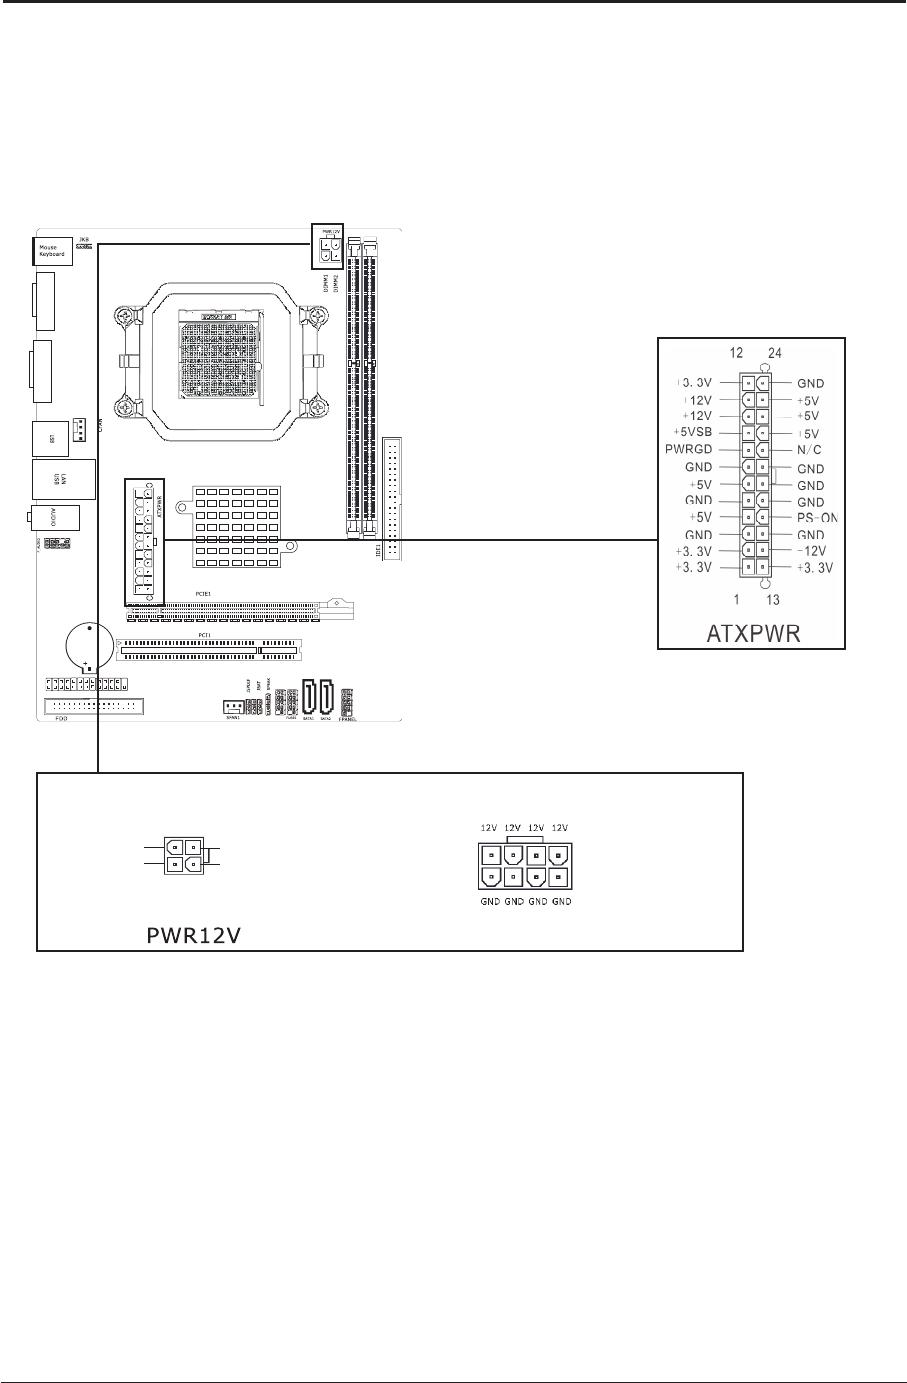 Nvidia Emaxx Mcp61D3 Icafe Users Manual ManualsLib Makes